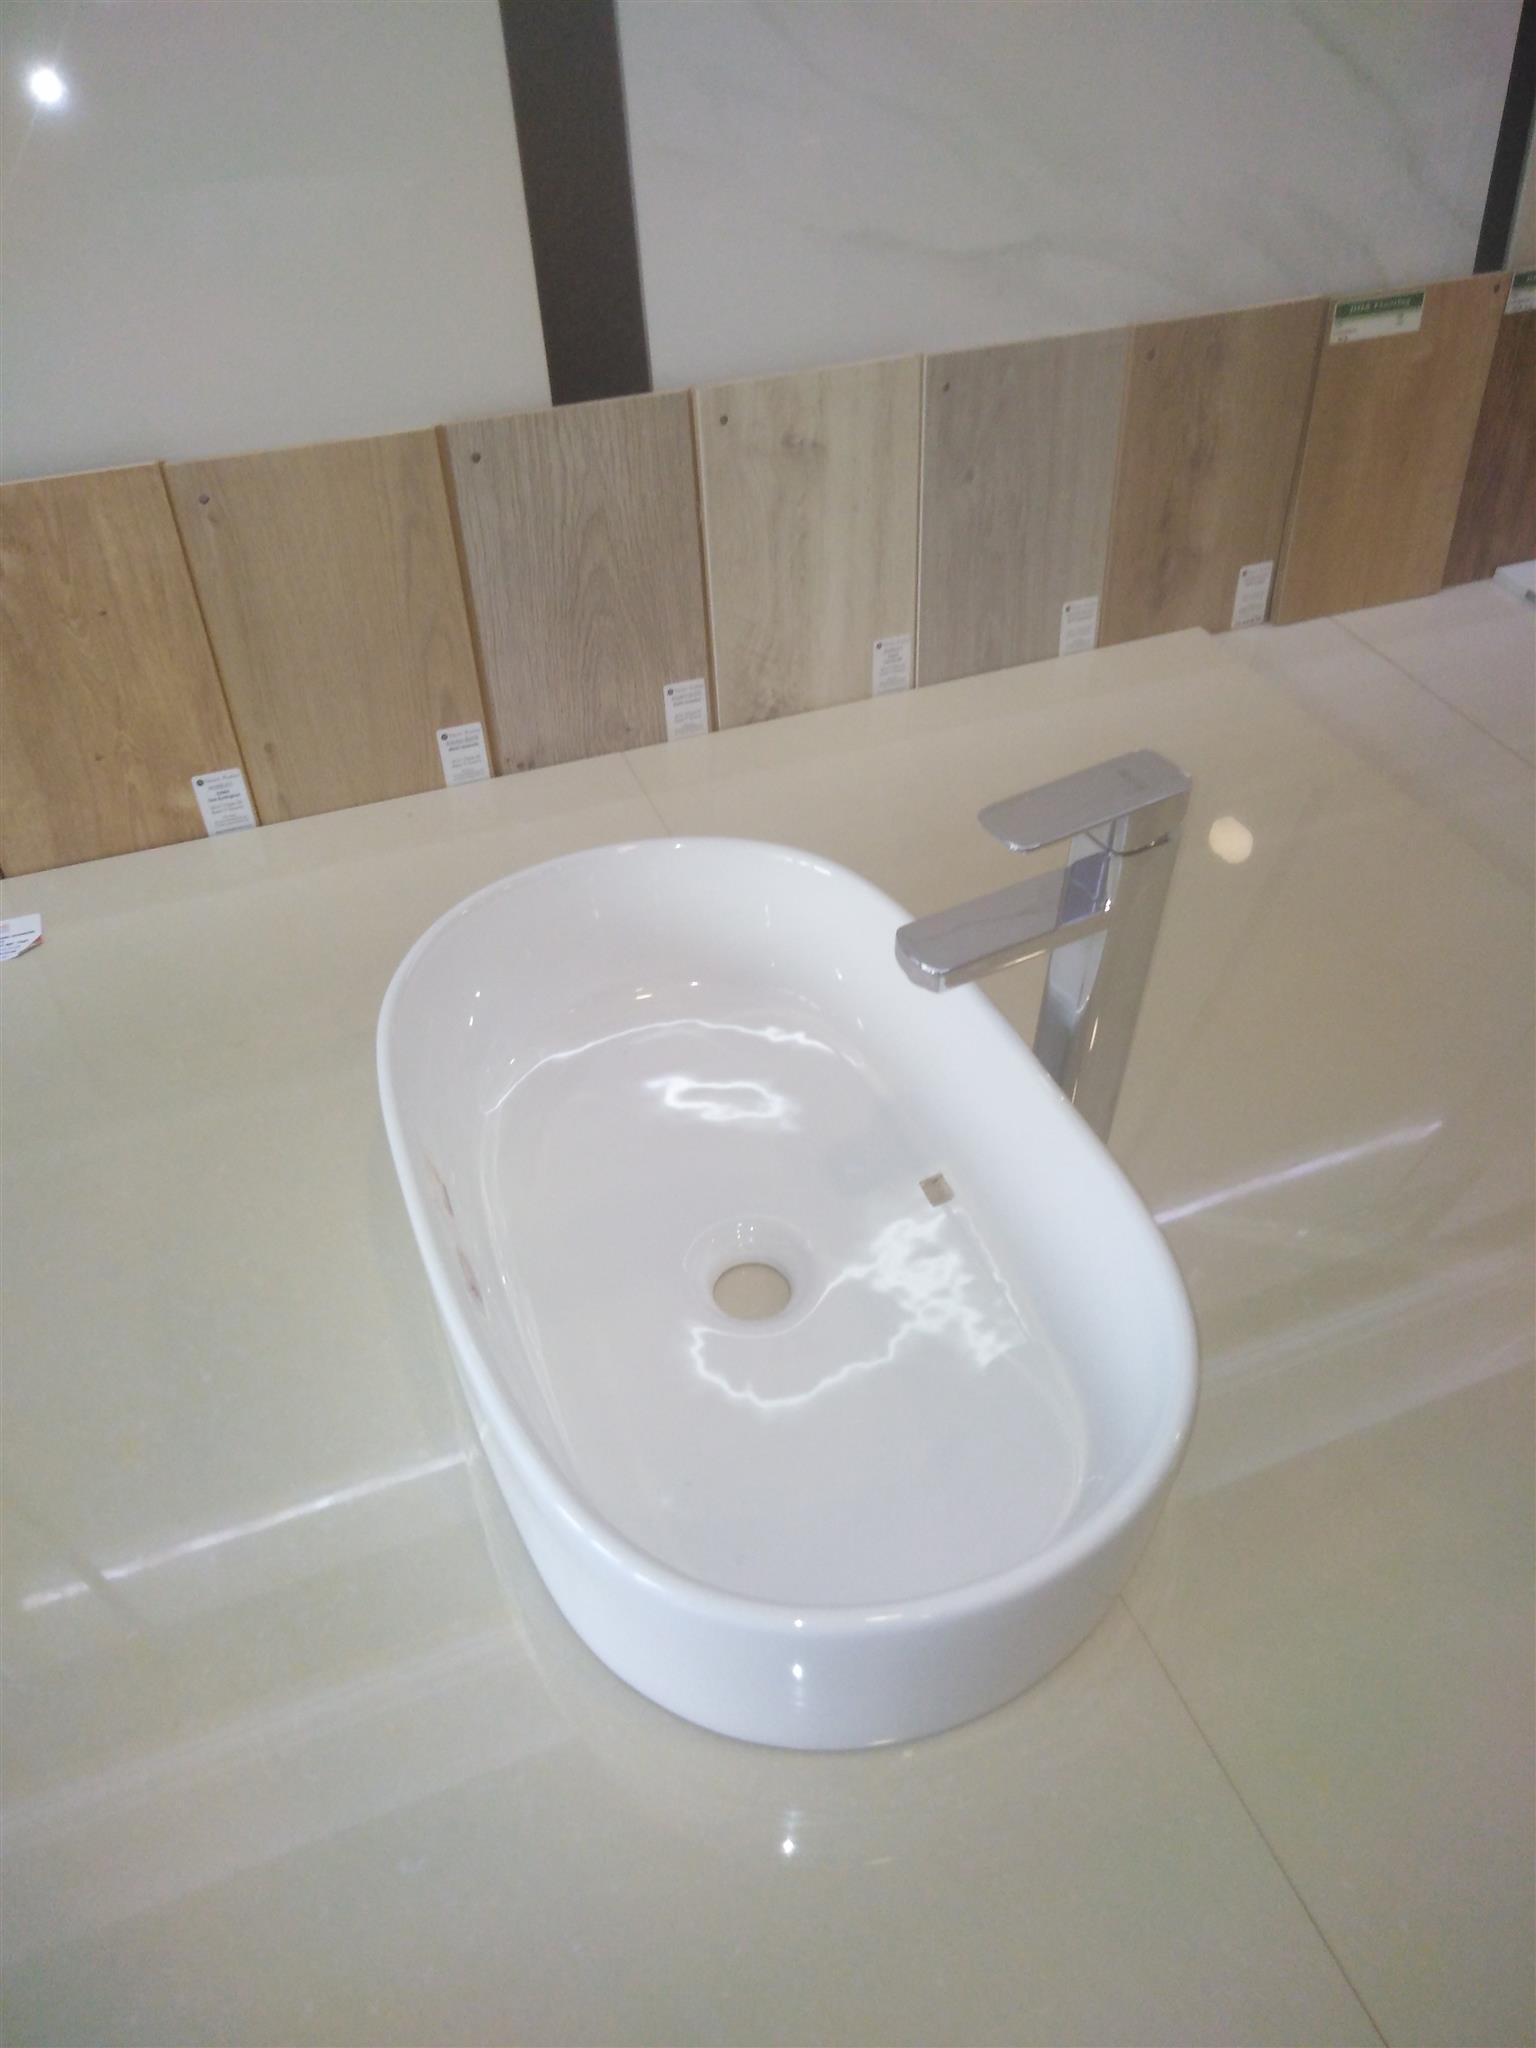 FREE STANDING BATHROOMS TUBES,JACUZZI,TOILET SEATS BASINS AND BASINS MIXER.